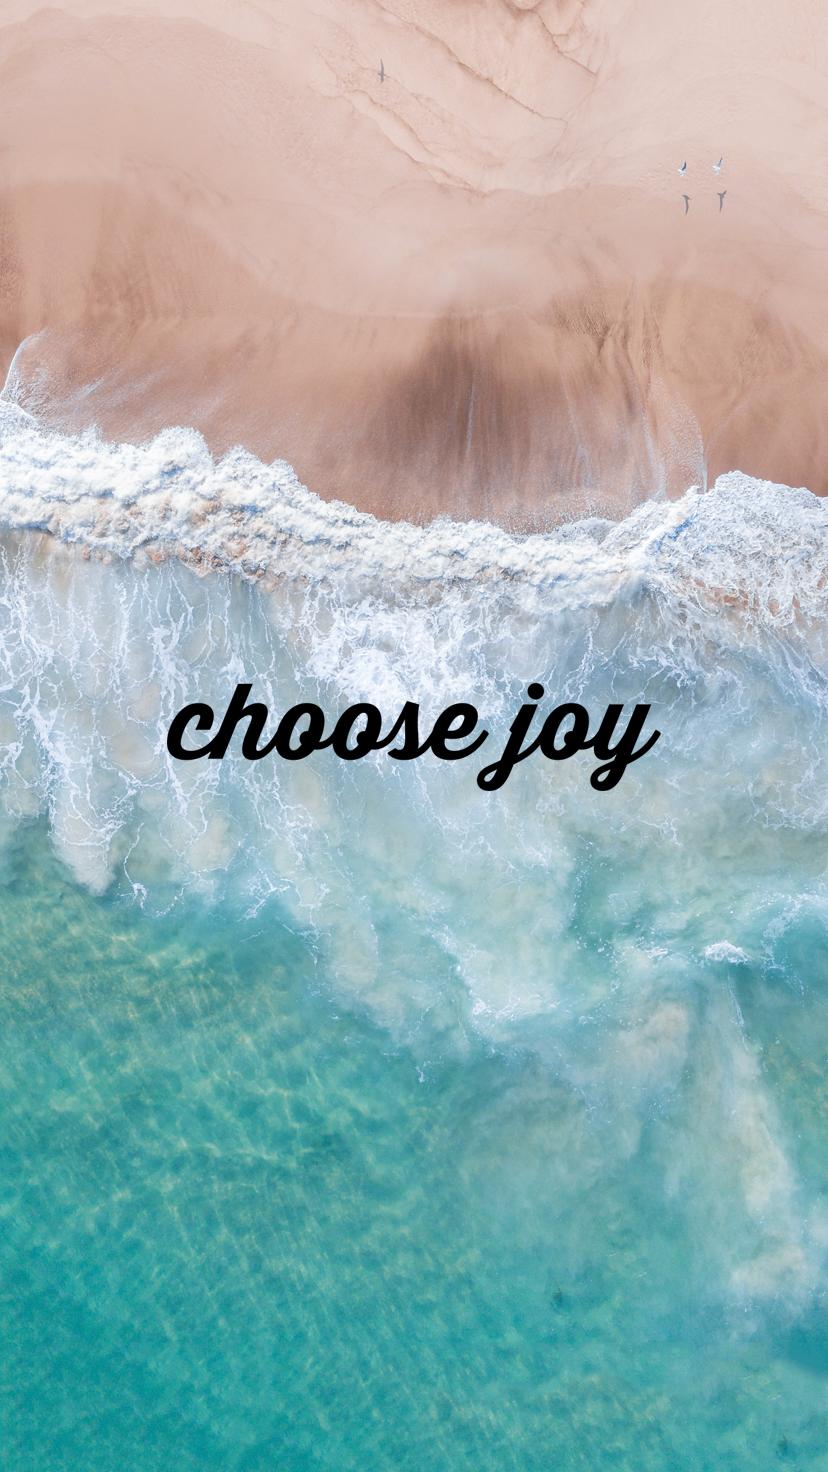 Choose-Joy-iPhone-Wallpaper.png